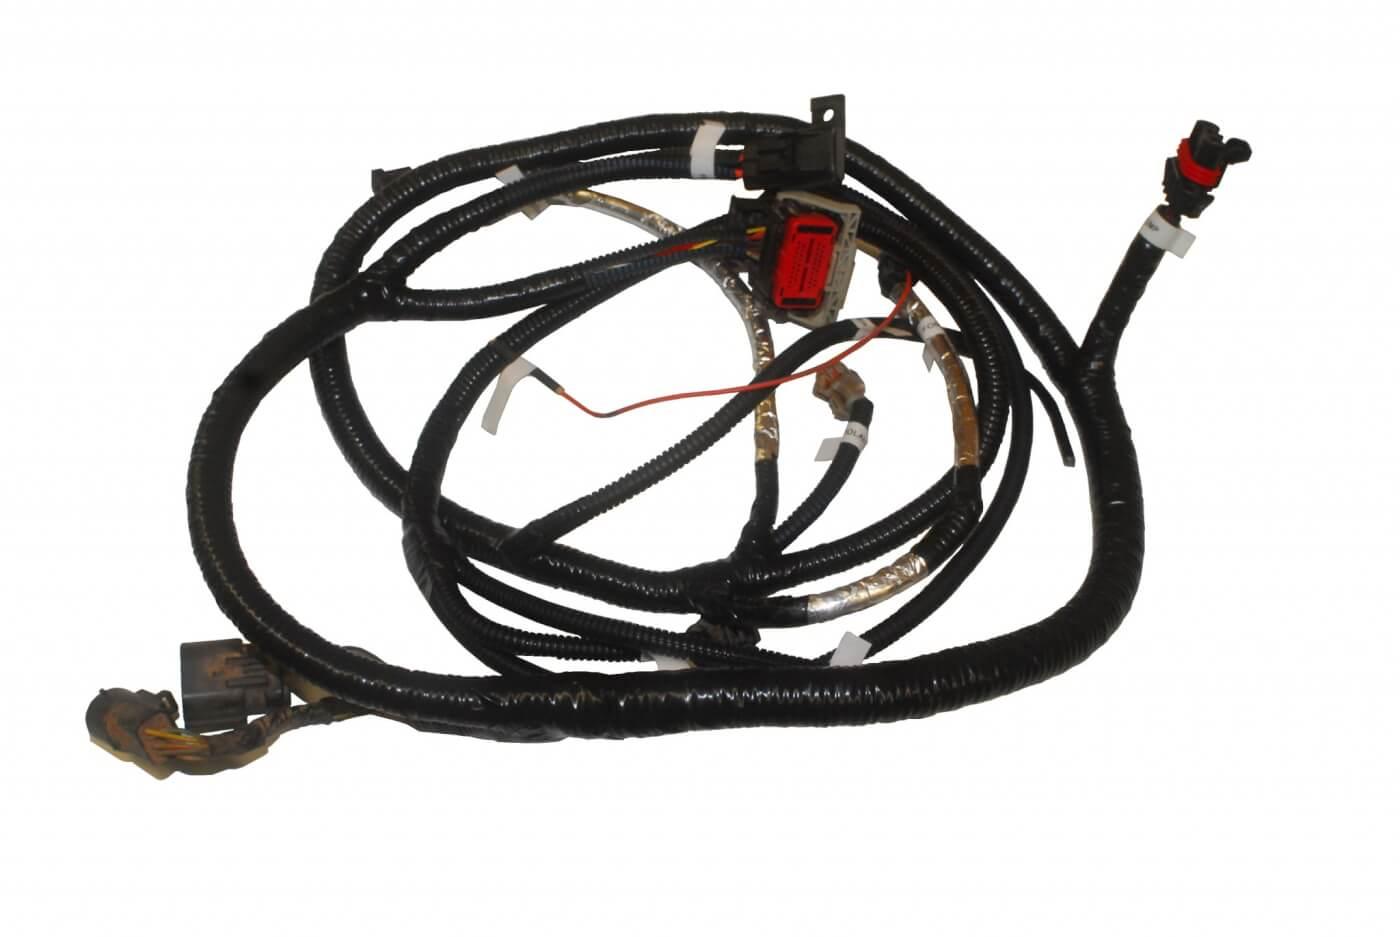 Diesel Harness Wiring Services